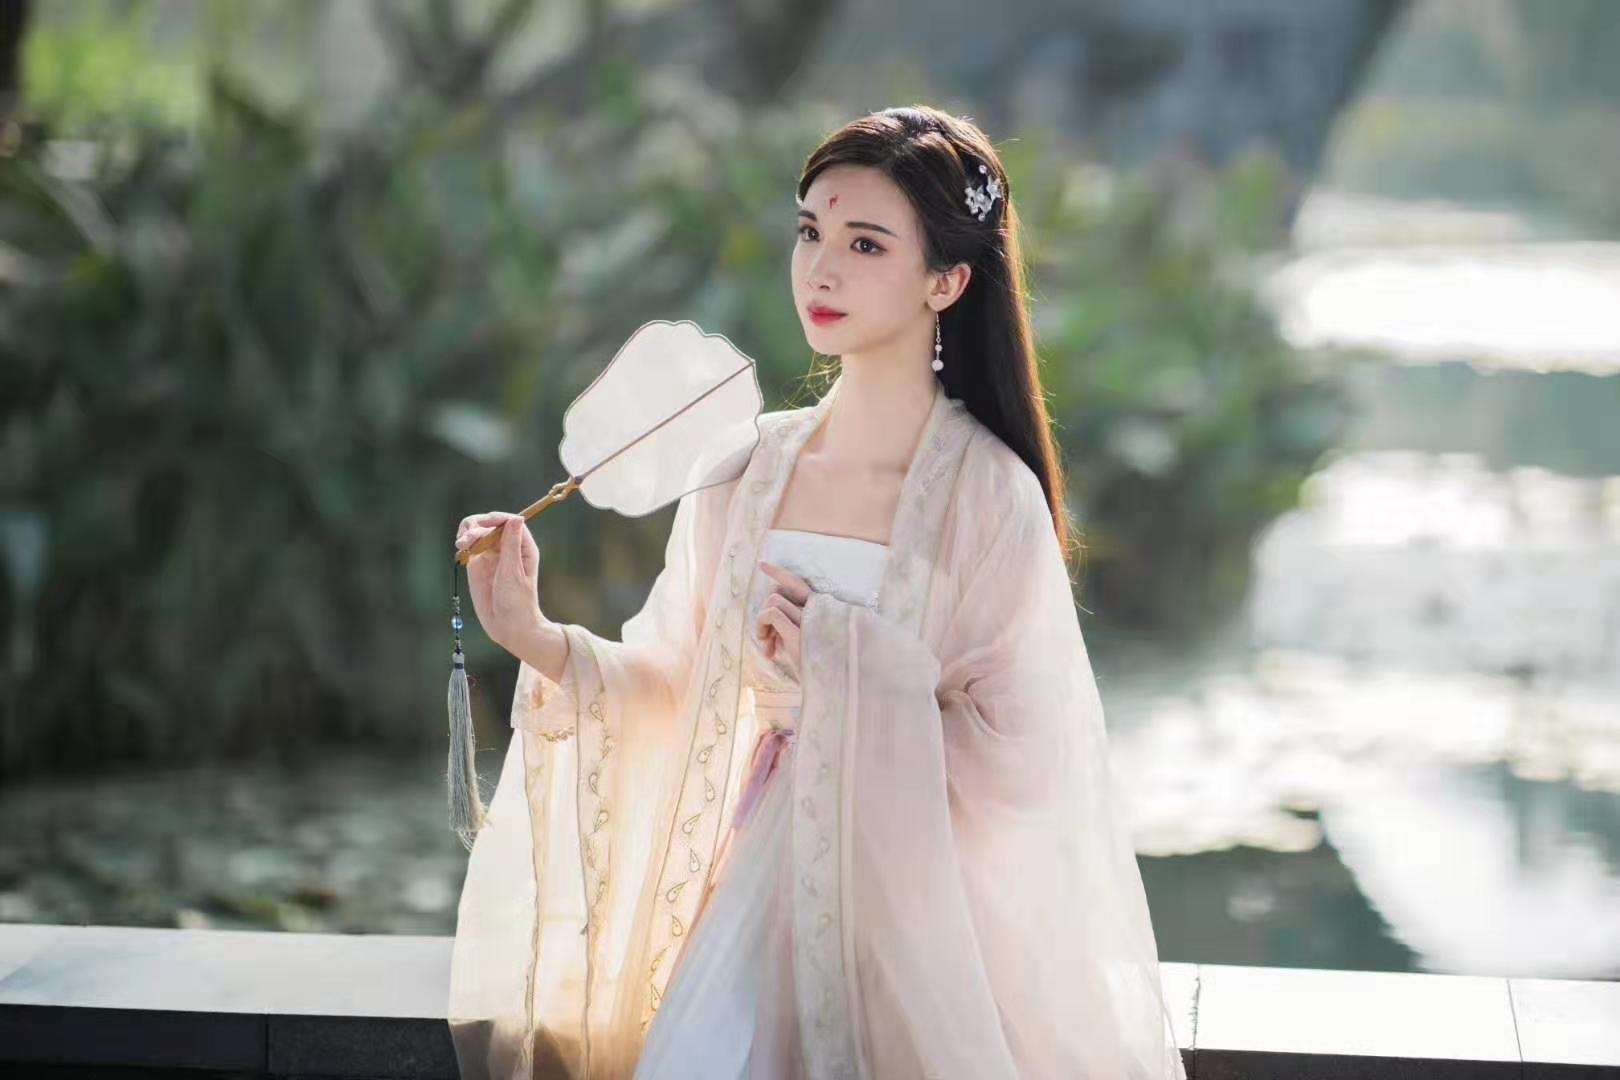 https://guo-nei.oss-cn-beijing.aliyuncs.com/shanghai/eruda/42.jpg